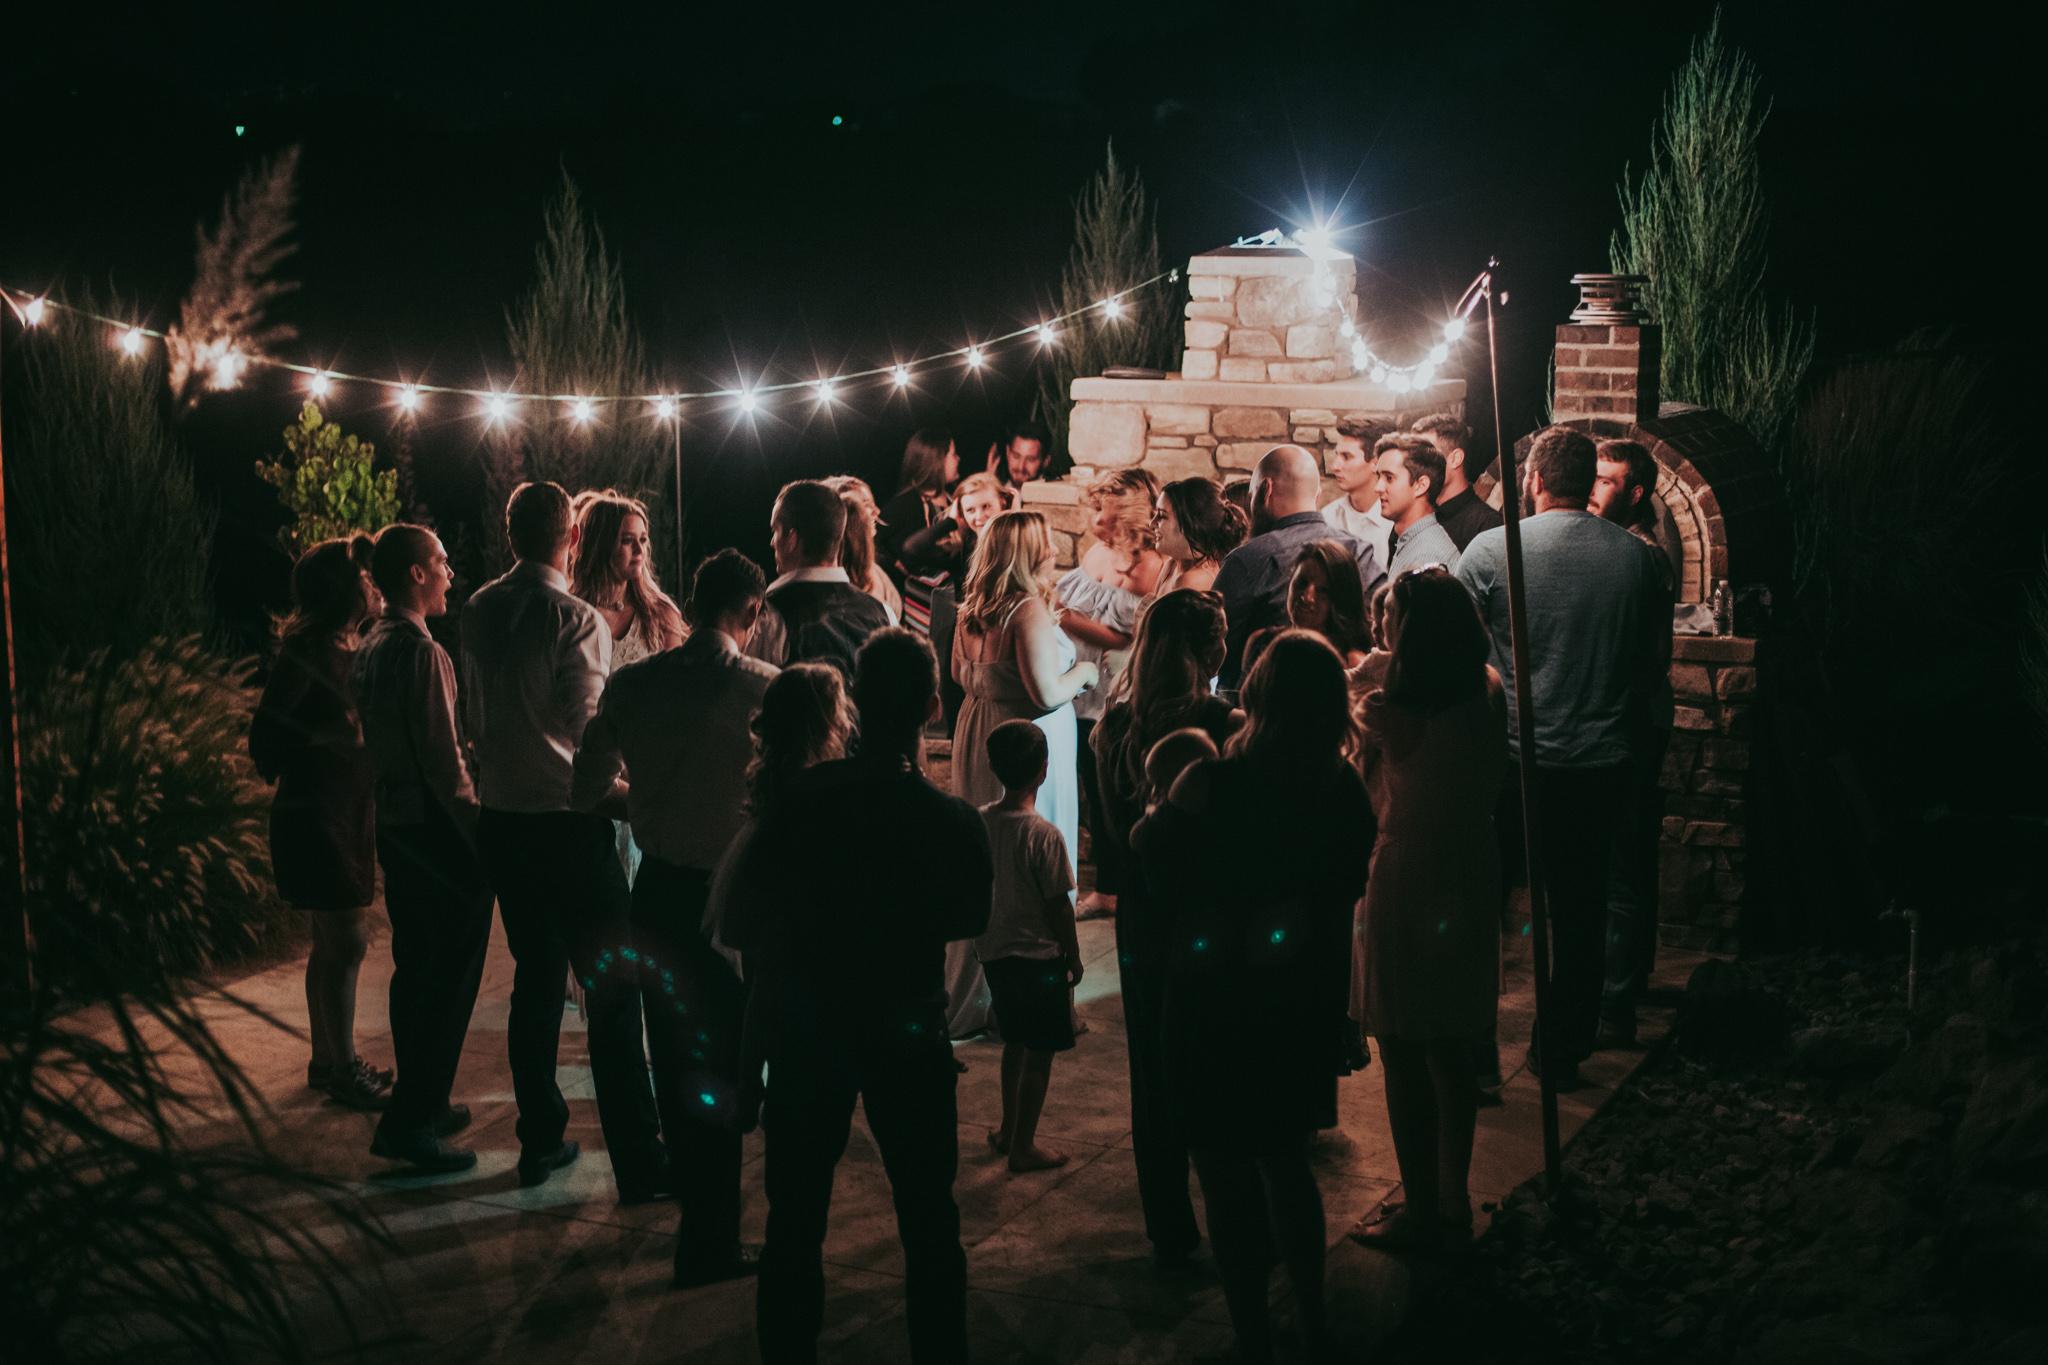 Olga_janni_wedding_090917_WEBSIZE (678 of 704).JPG